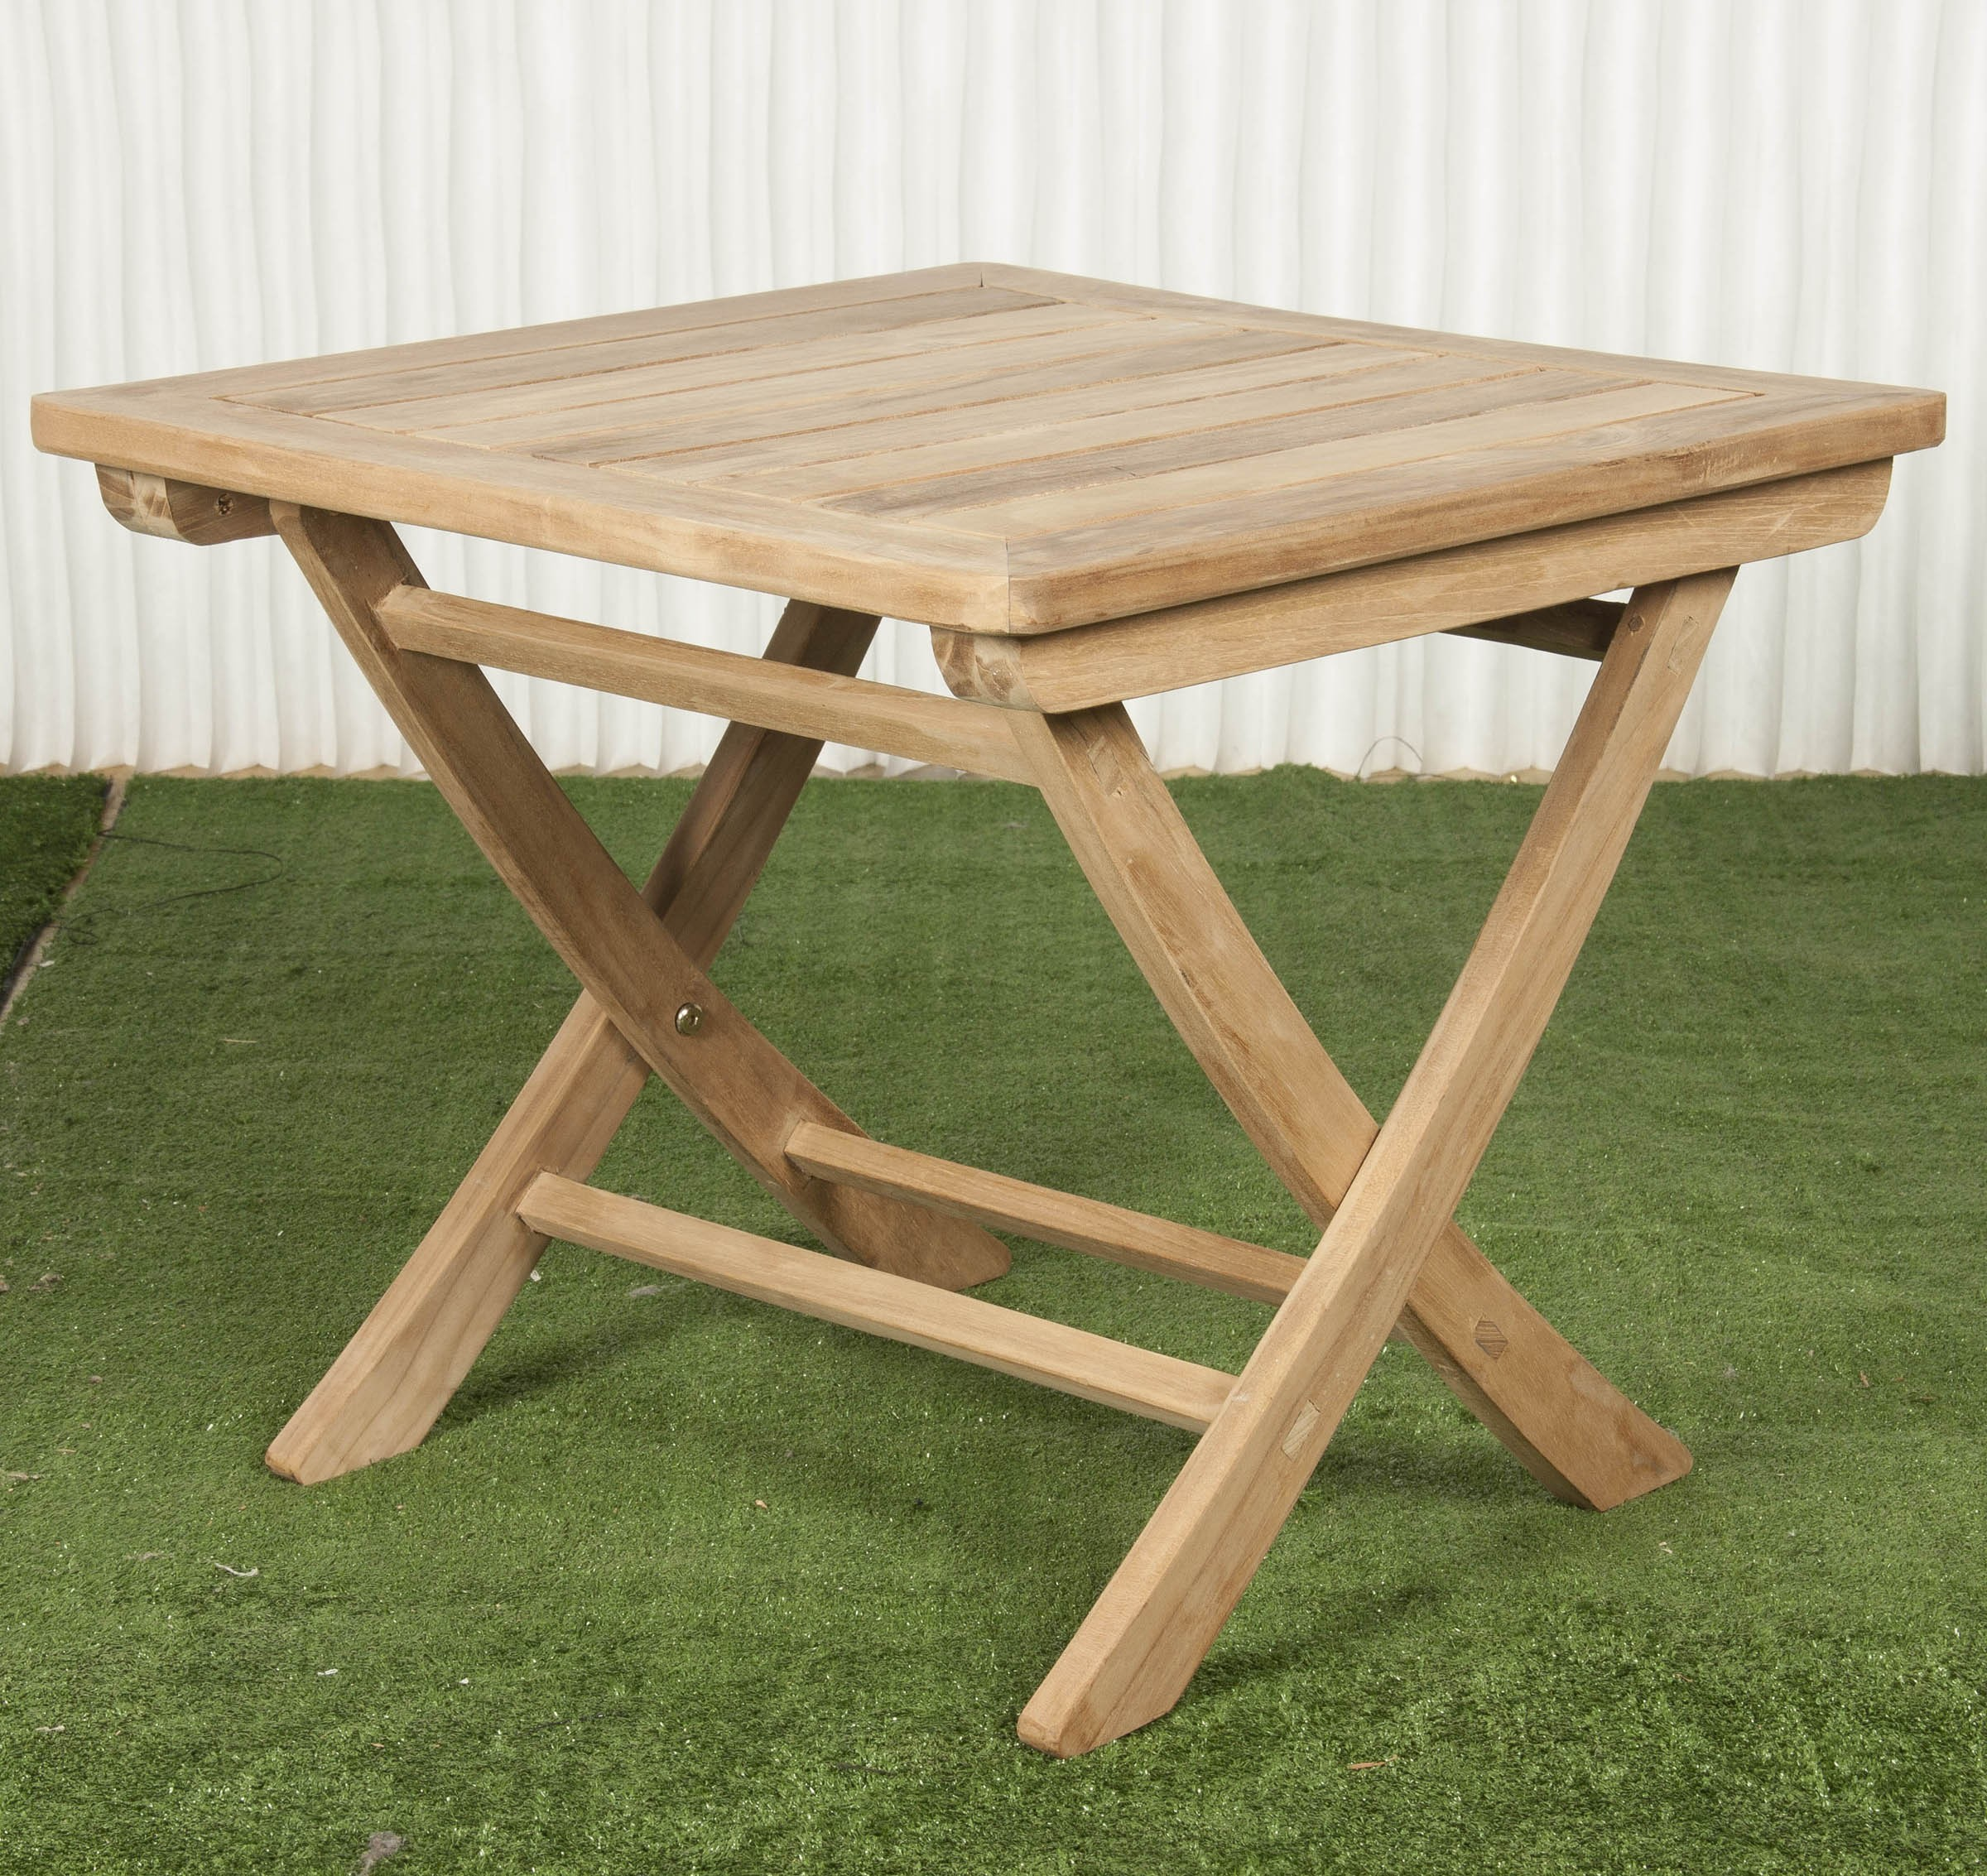 Mesa exterior y mesa plegable batavia for Mesas de comedor para exterior